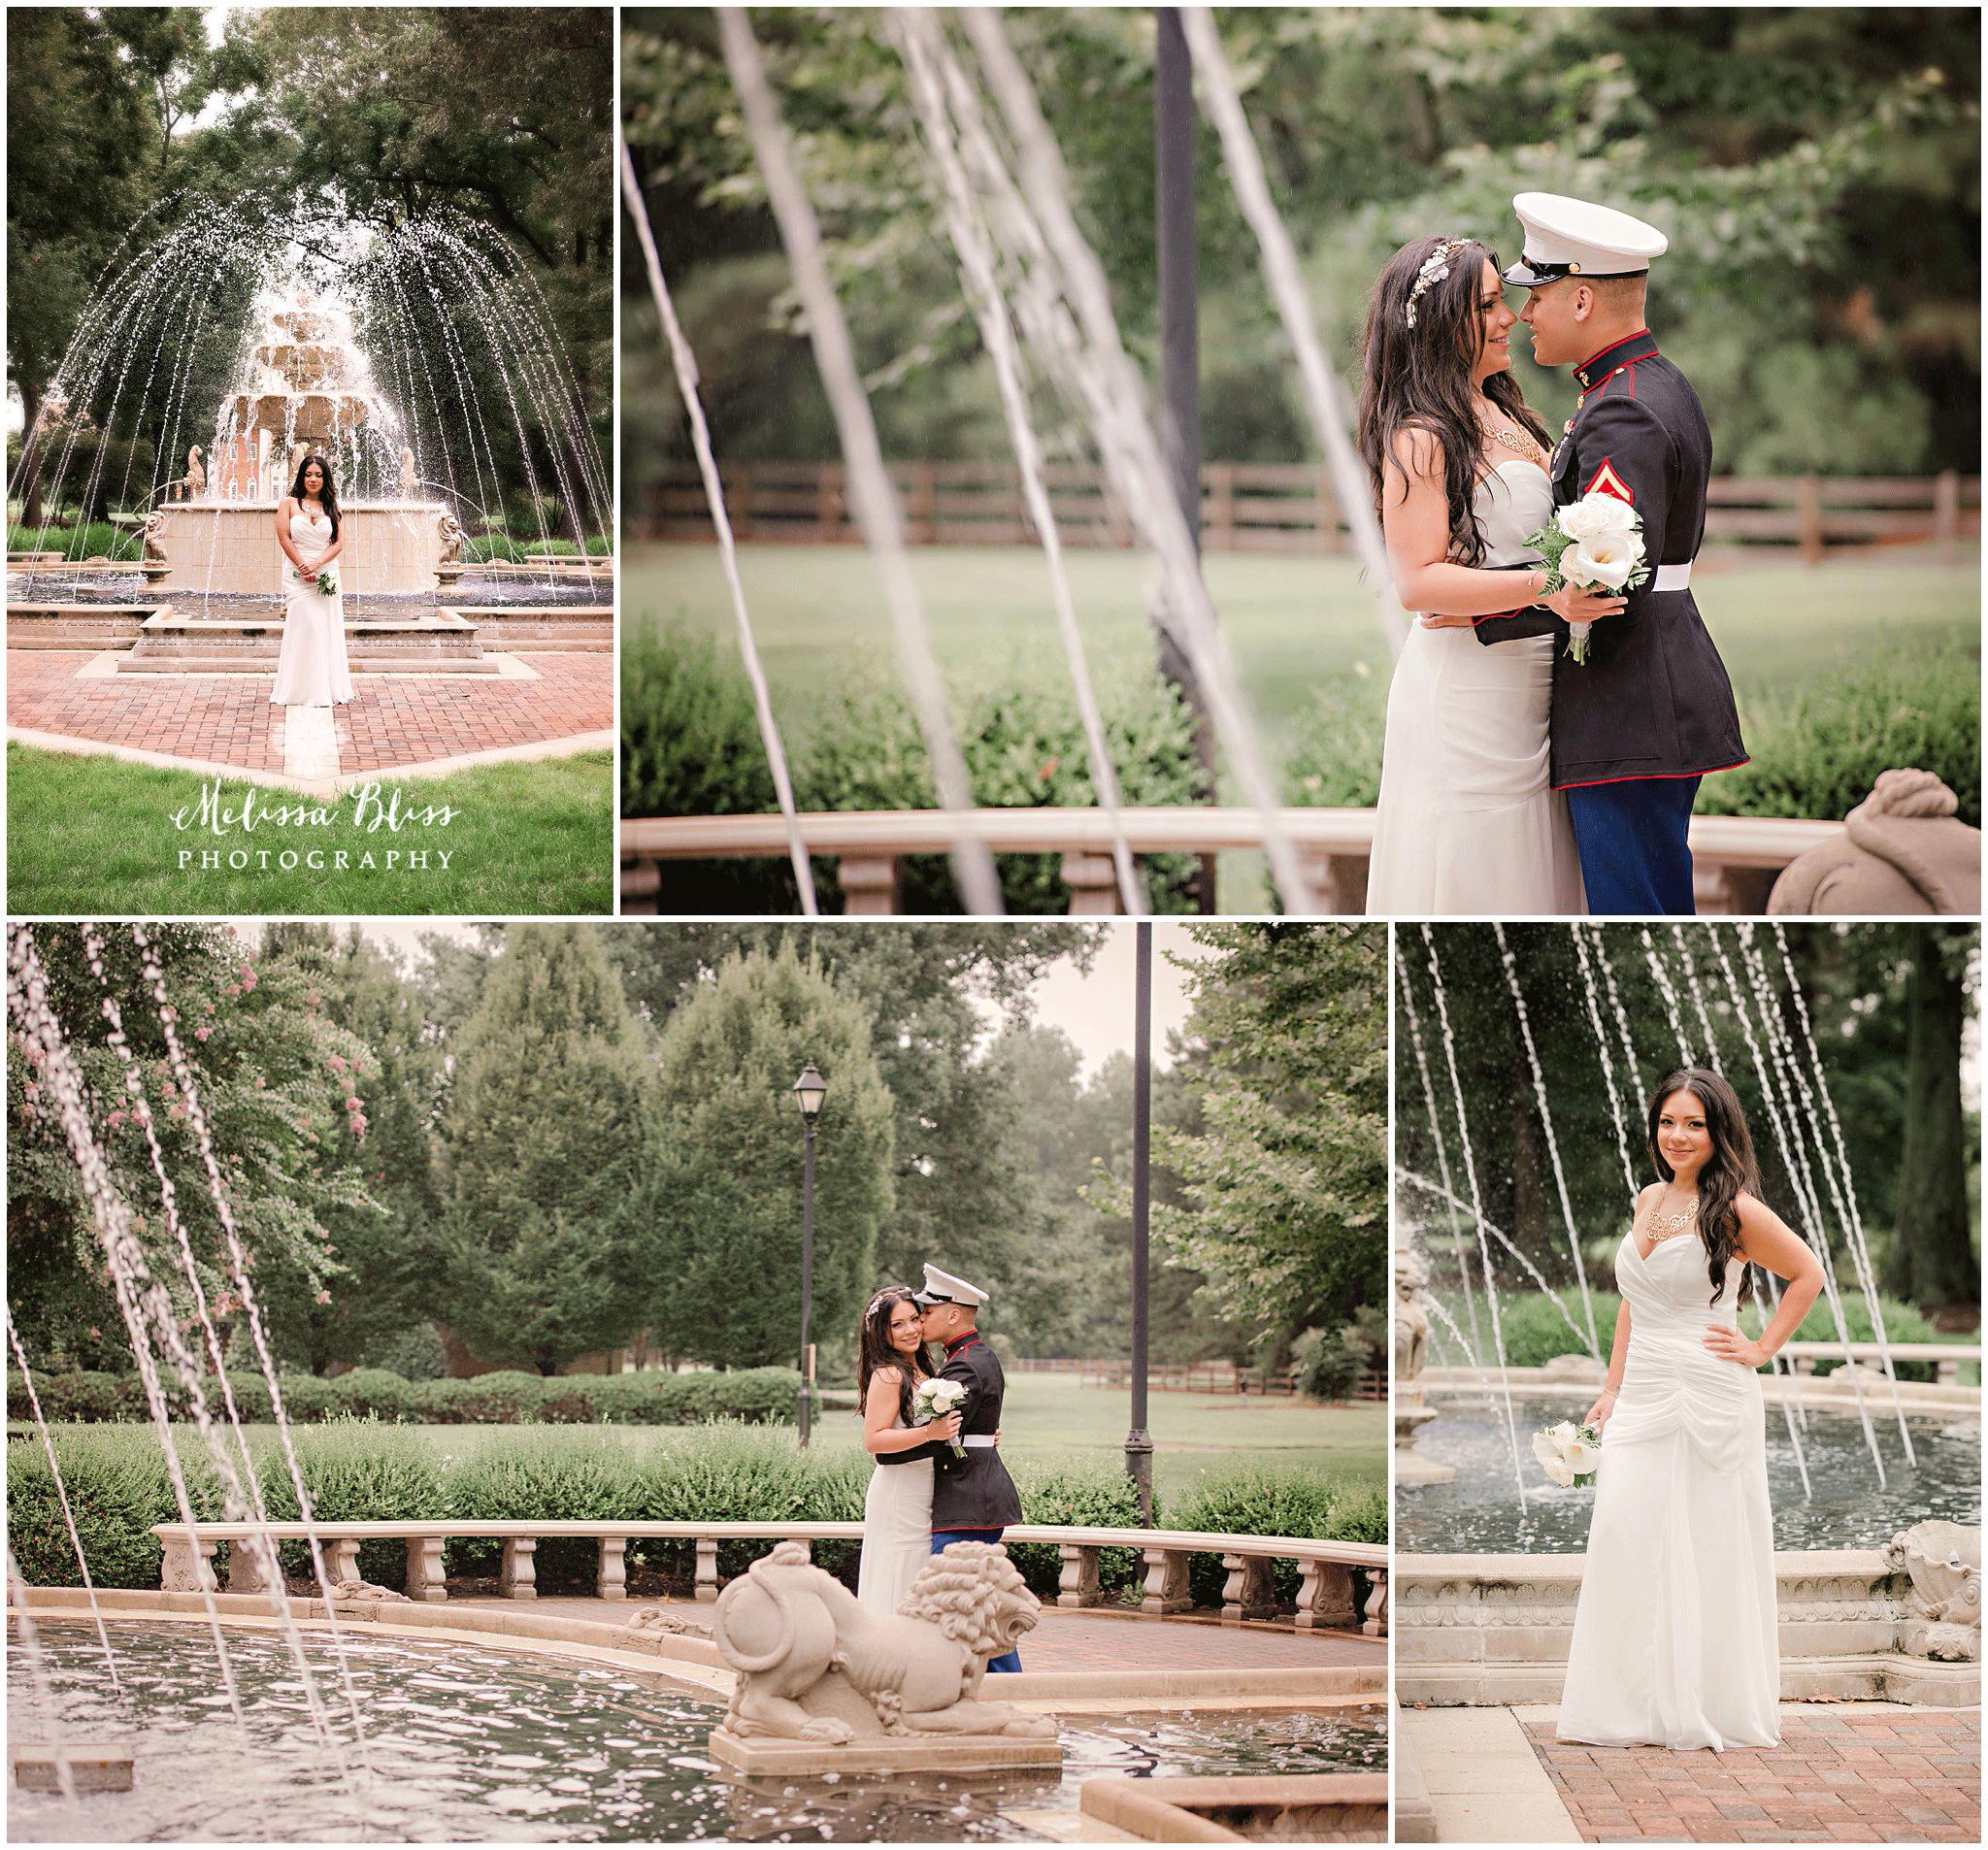 portsmouth-norfolk-chesapeake-williamsburg-wedding-photographers-melissa-bliss-photography-virginia-beach-elopement-photos